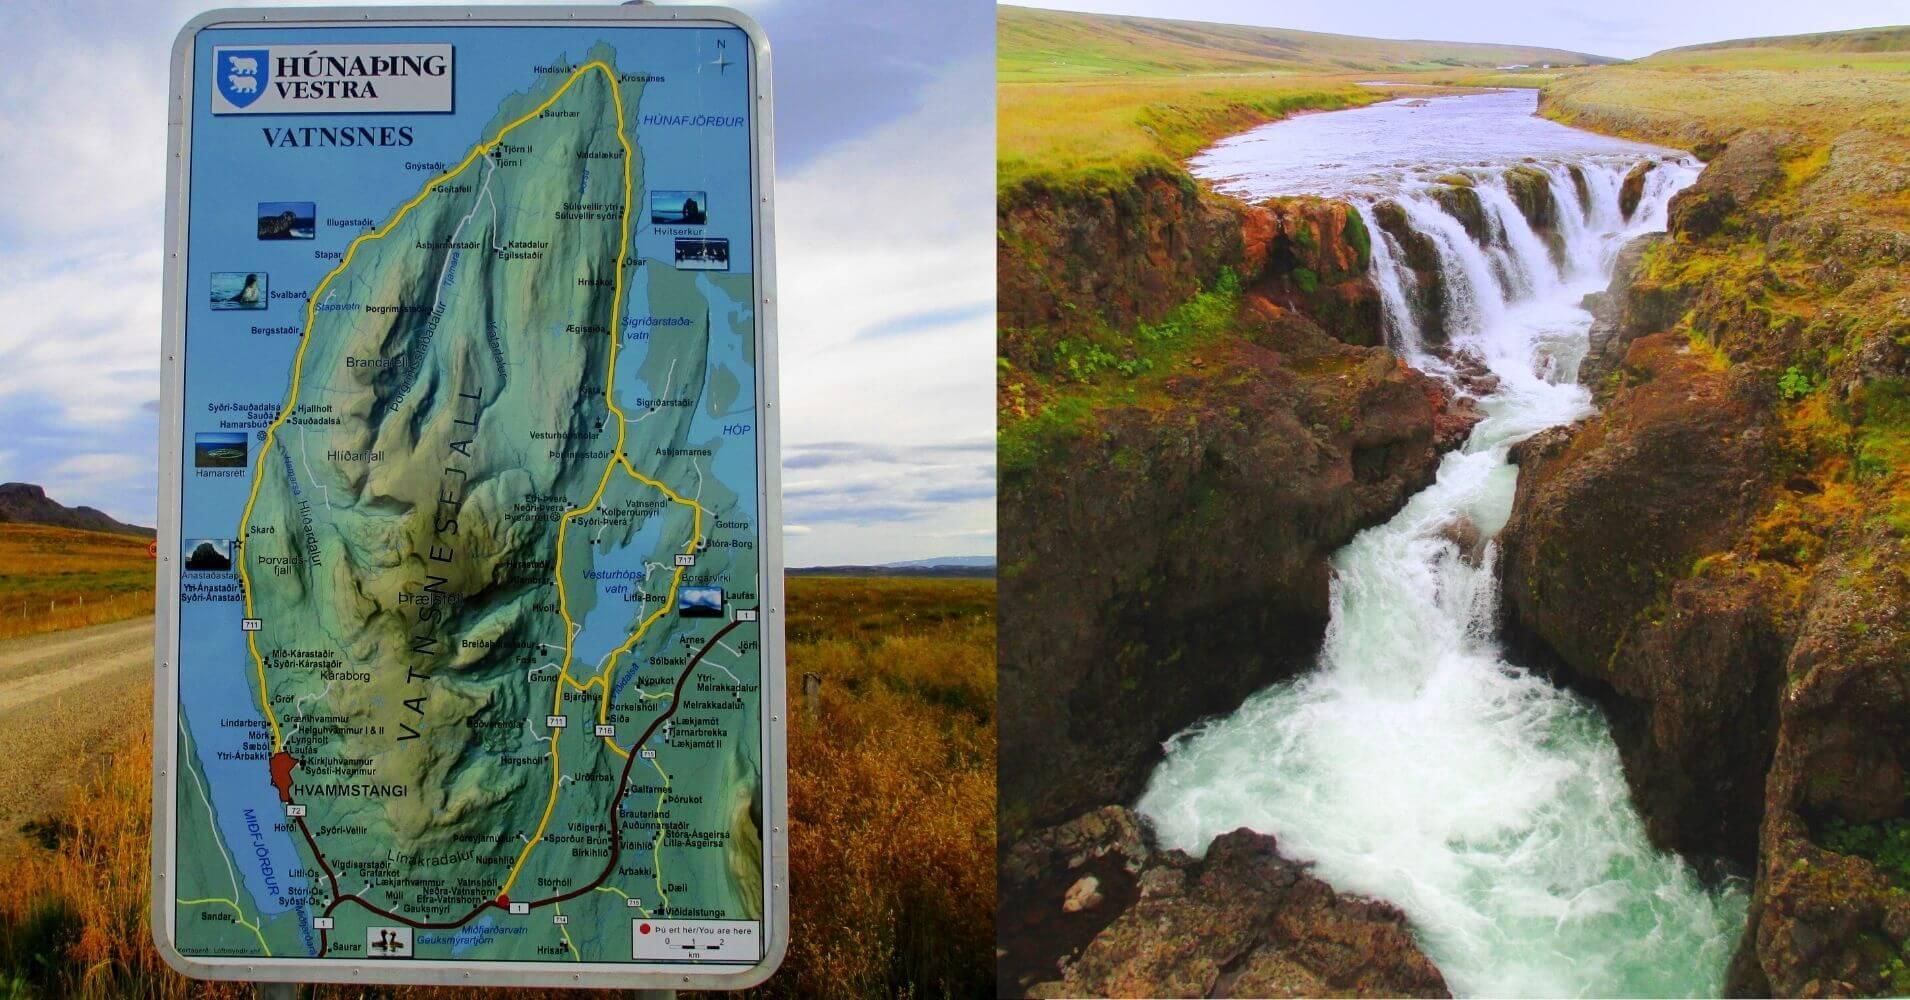 Cartel Península de Vatnsnes. Hvammstangi. Norðurland Vestra. Islandia.